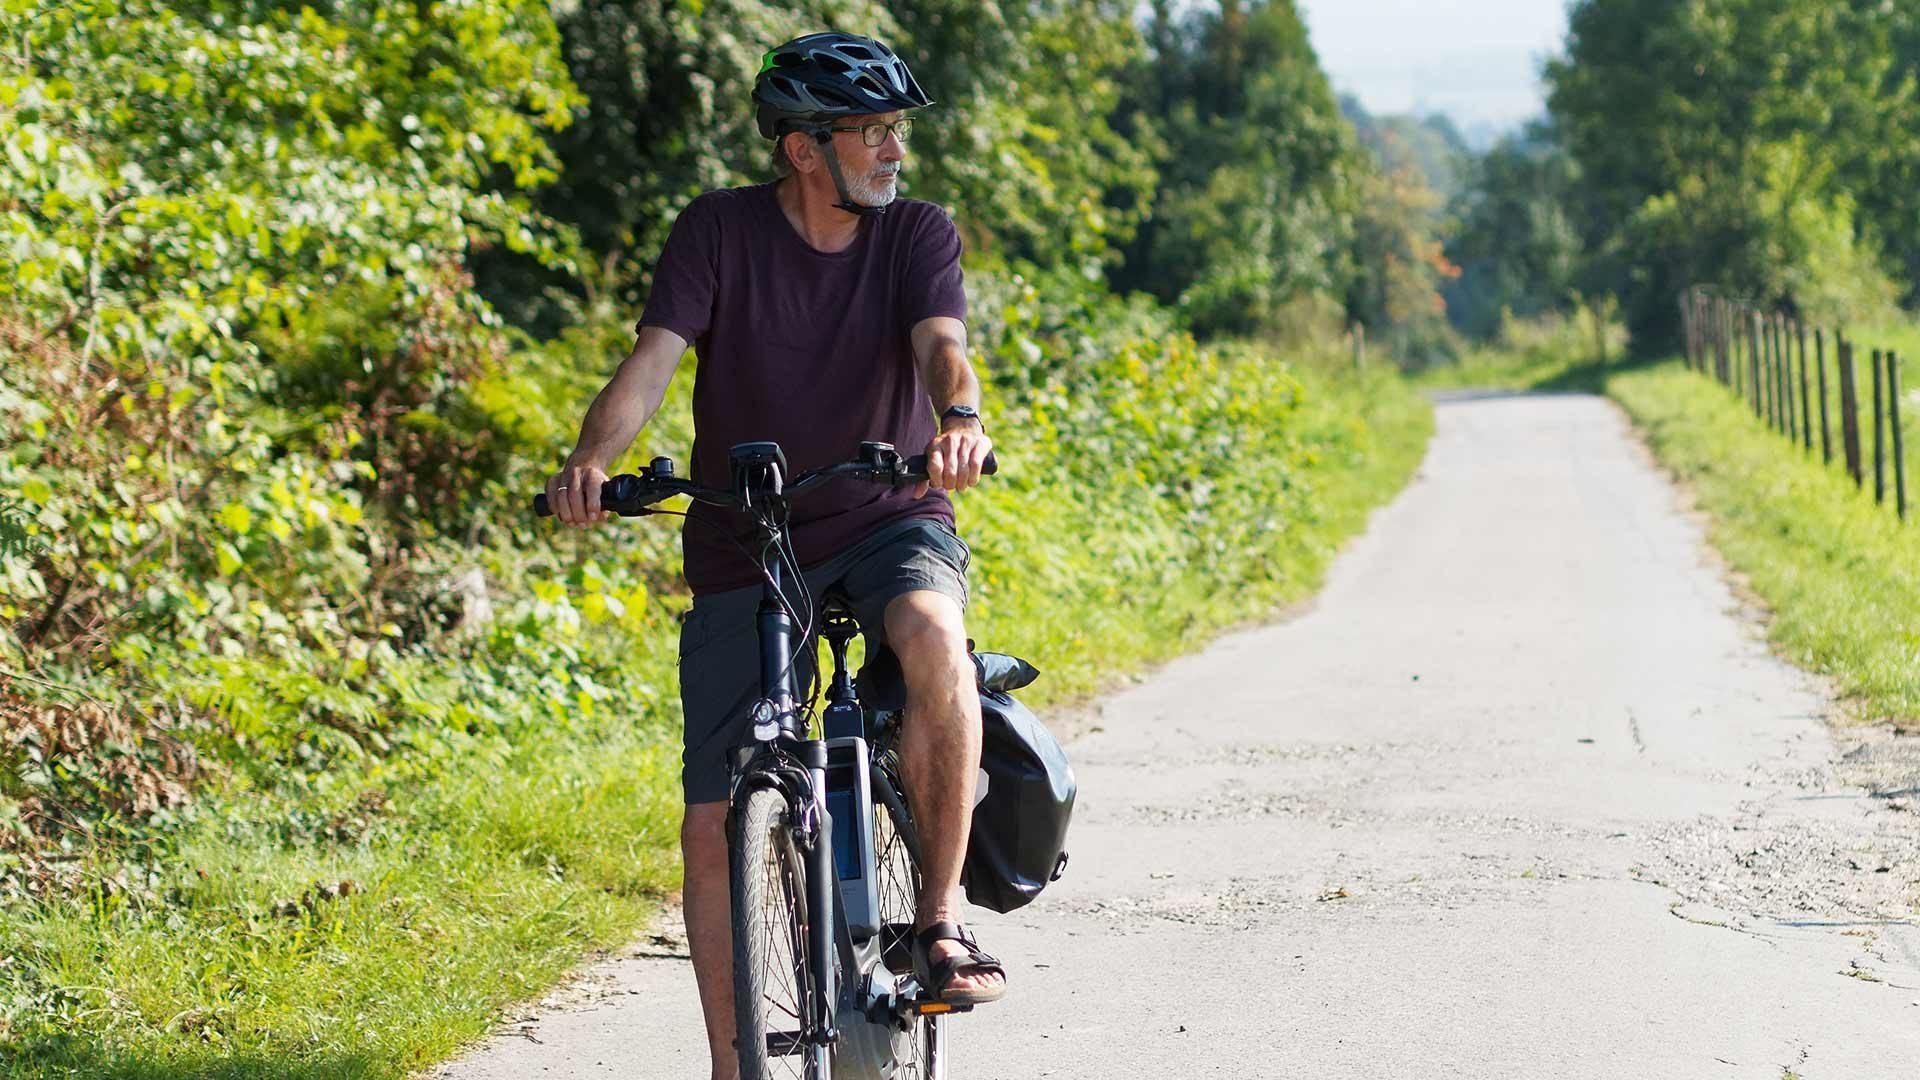 Giro in bicicletta Cermes - Marlengo